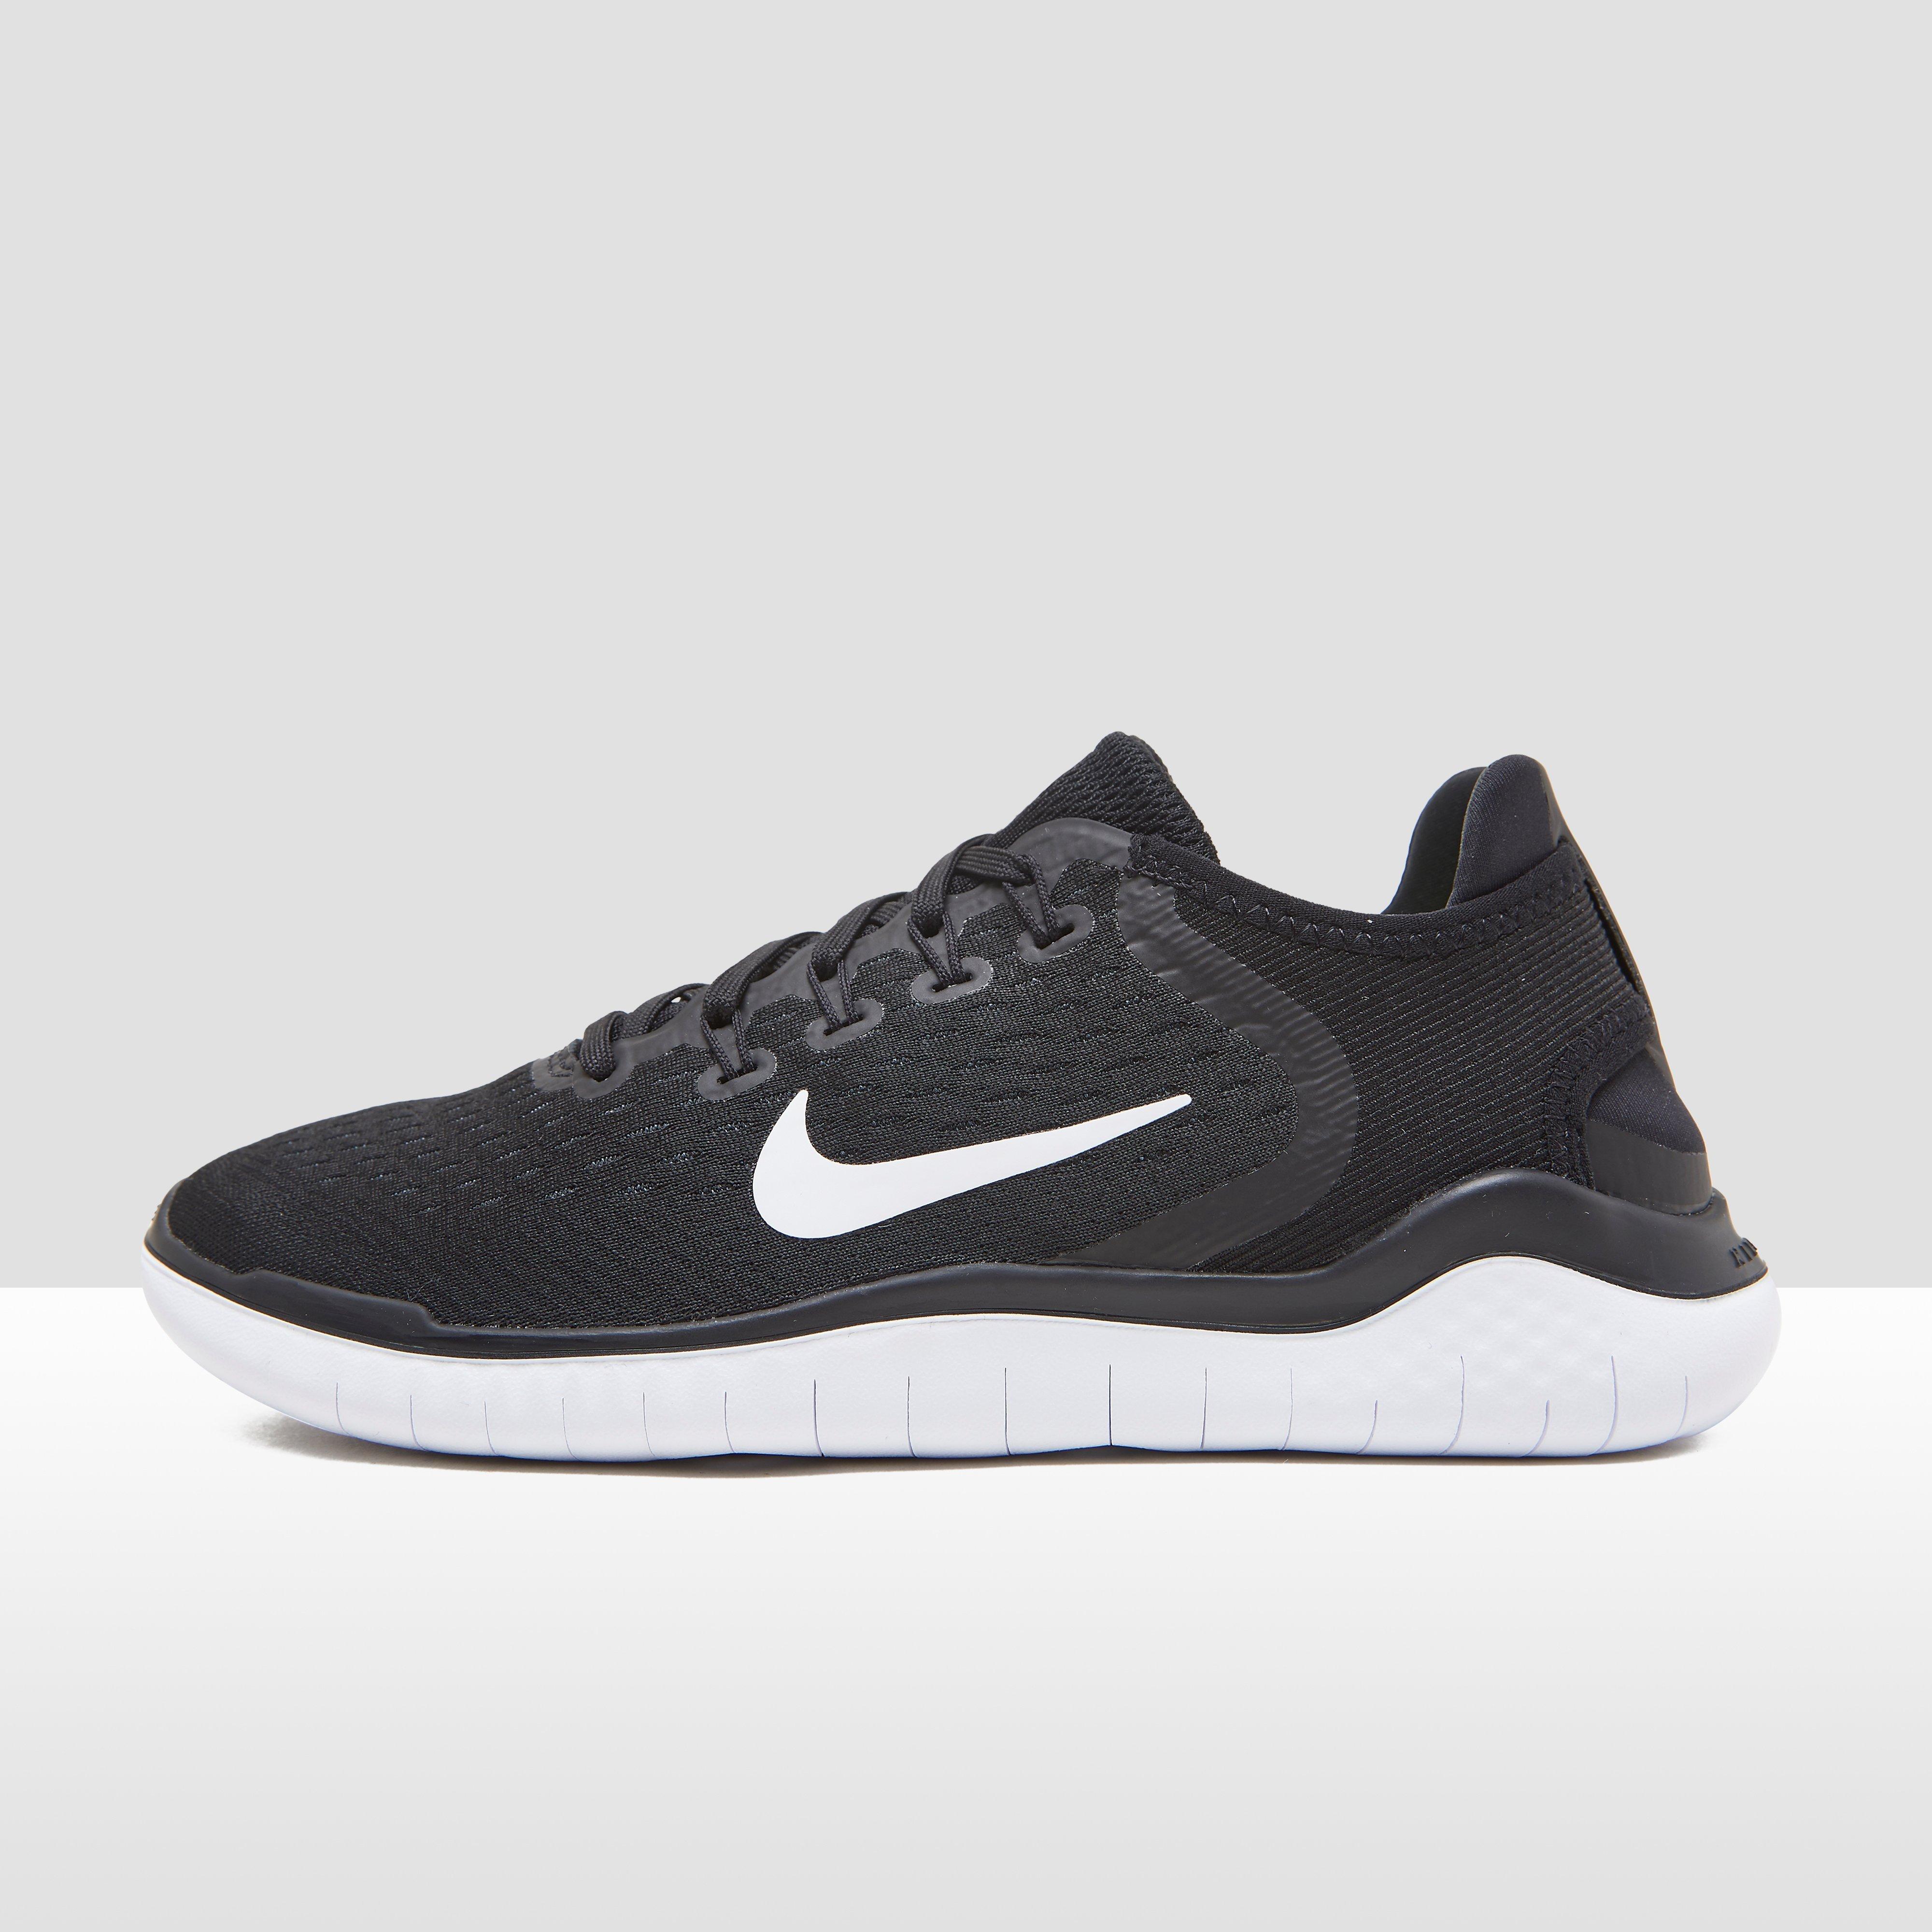 Chaussures Nike Free Running Rn 2018 - Noir / Blanc xoQyI1E